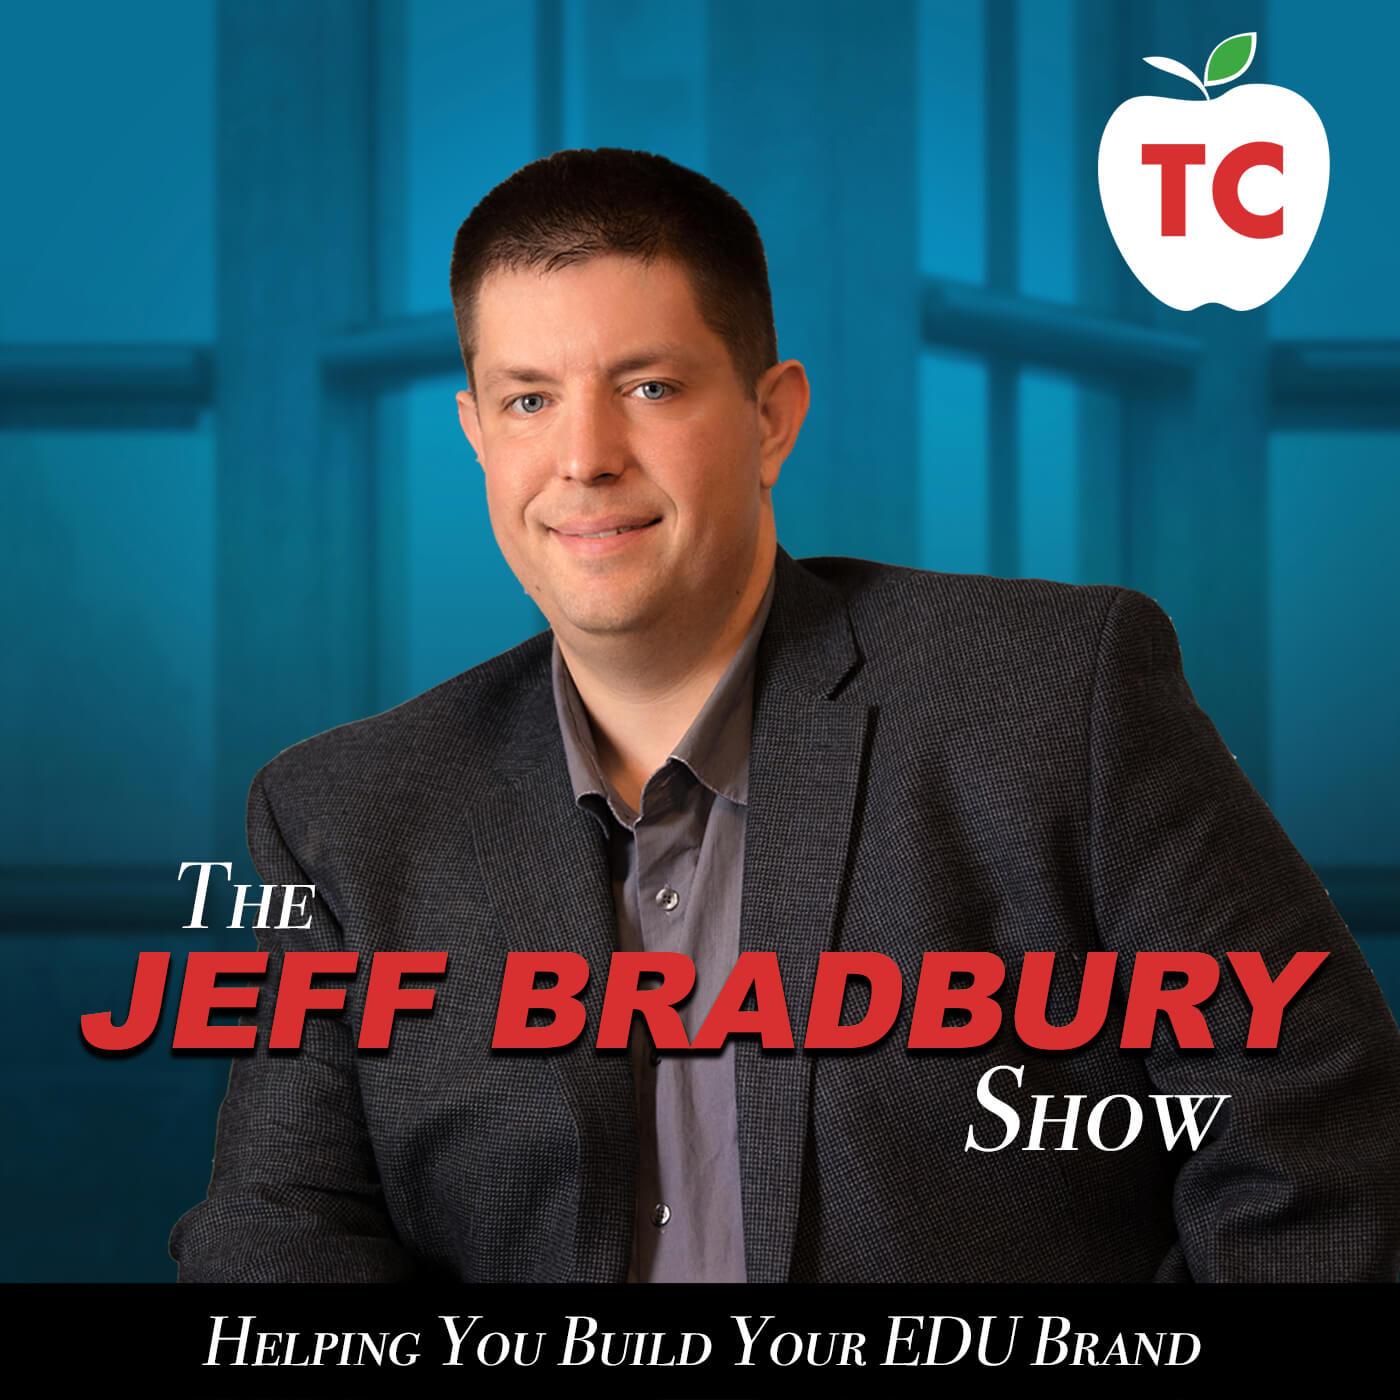 The Jeff Bradbury Show 1400x1400 Podcast Square Compressed